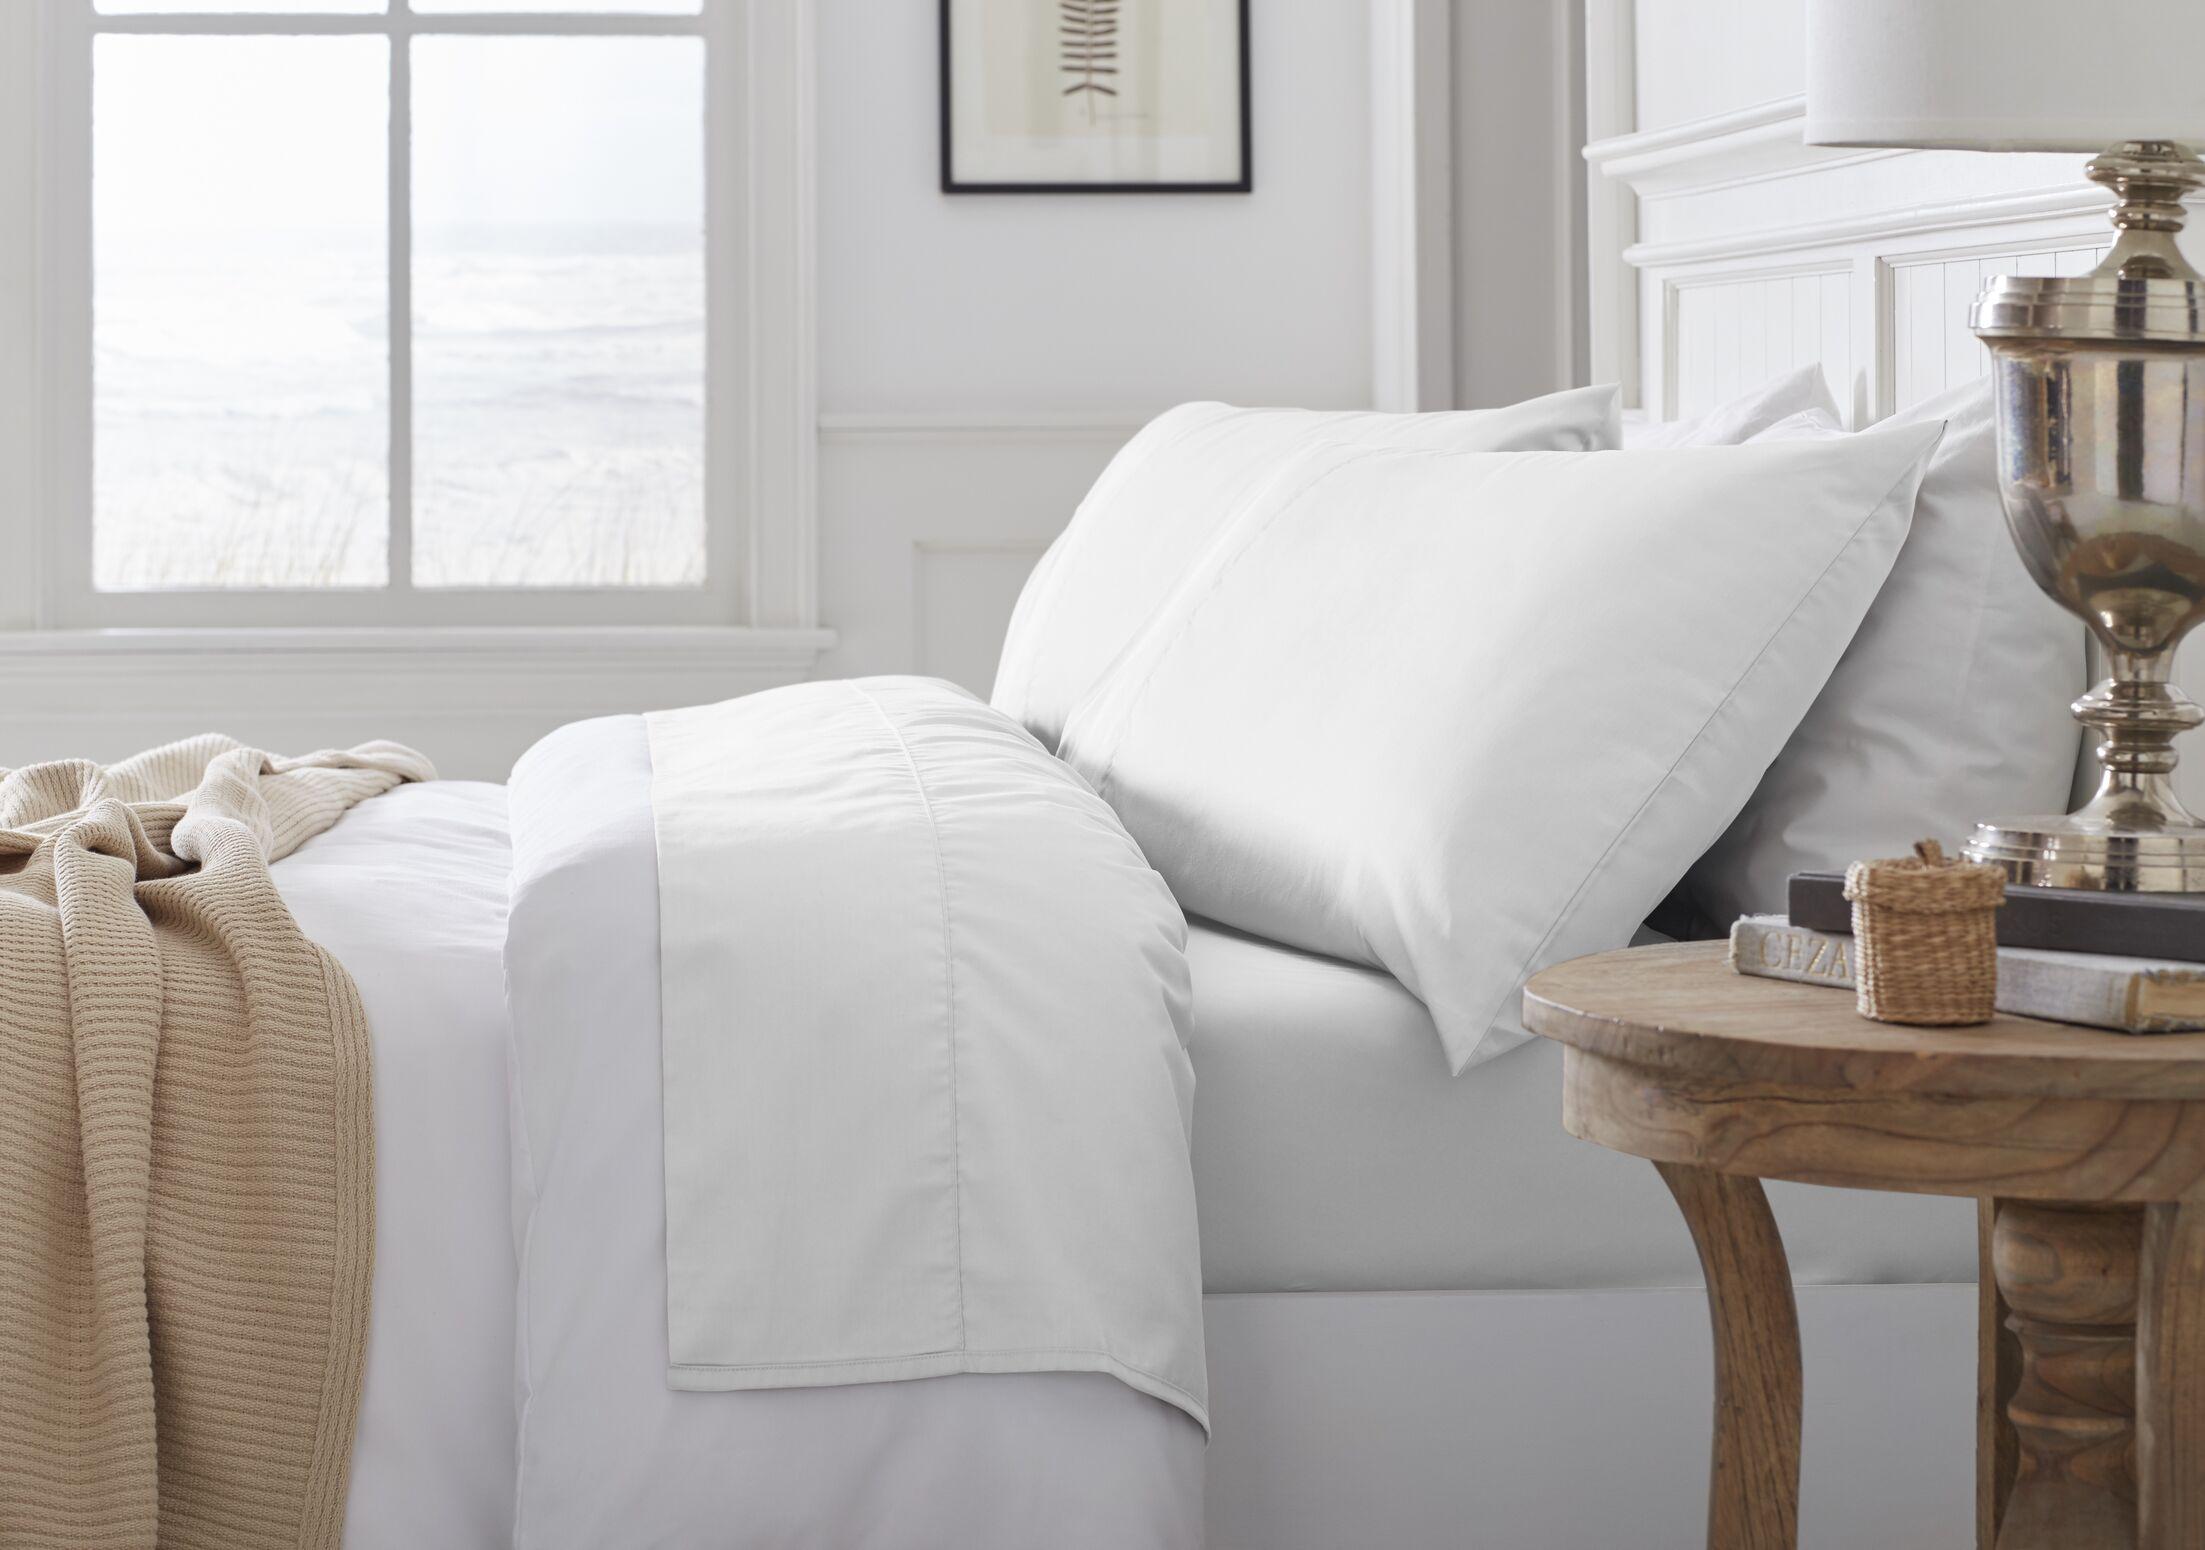 Nava Savannah 300 Thread Count 100% Organic Cotton Sheet Set Size: King, Color: White